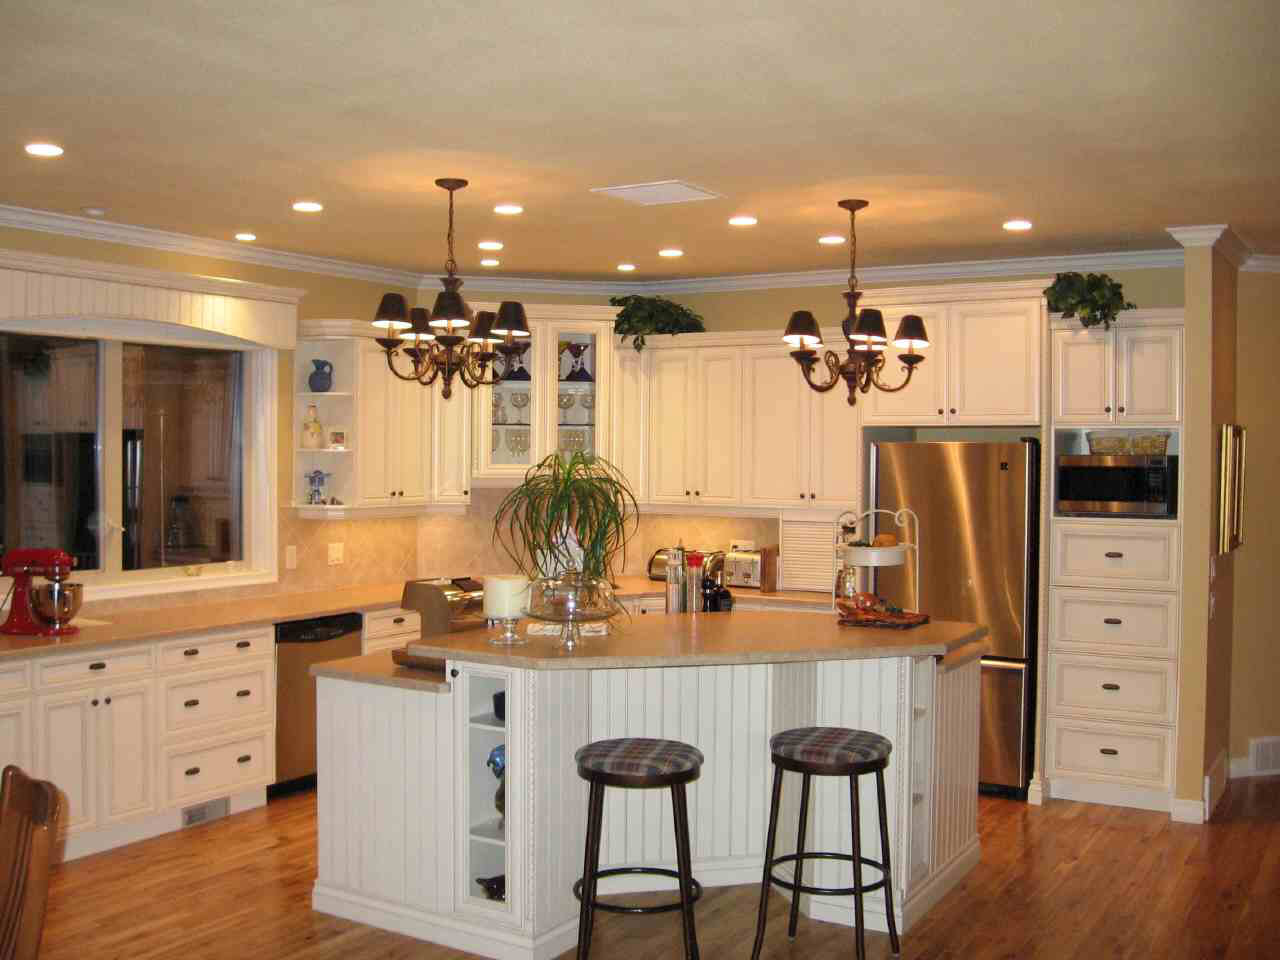 Kitchen decor accessories photo - 3